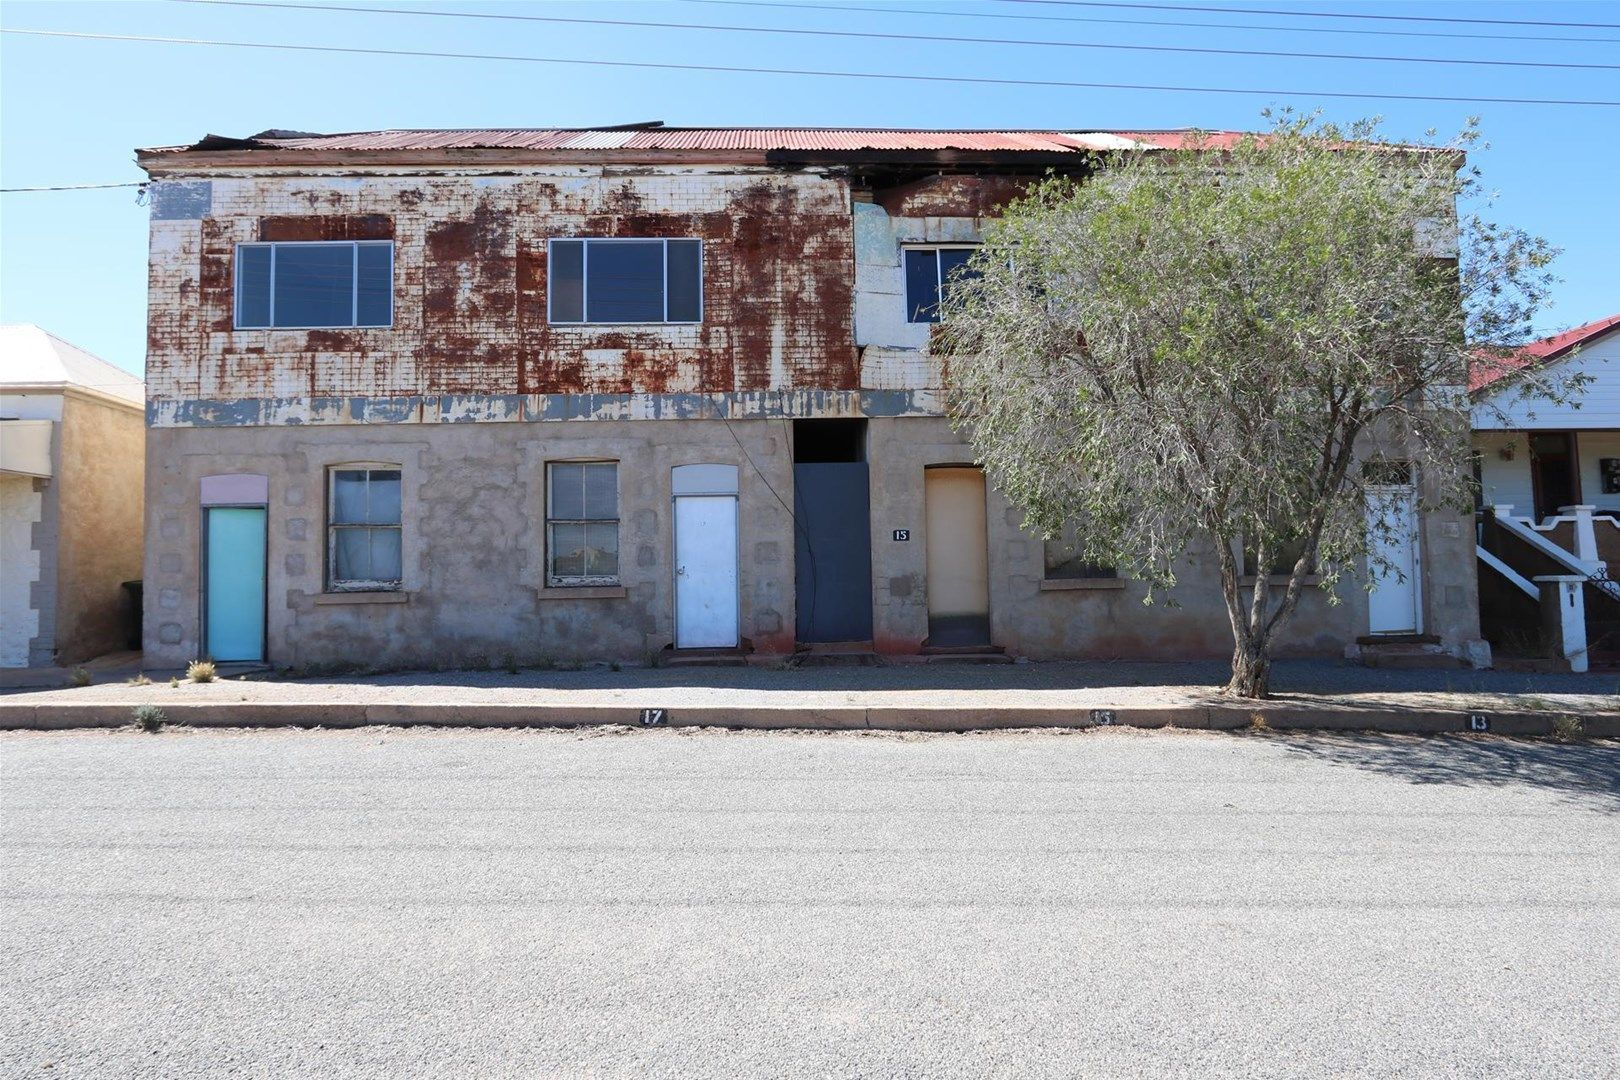 17-19 Argent Street, Broken Hill NSW 2880, Image 0